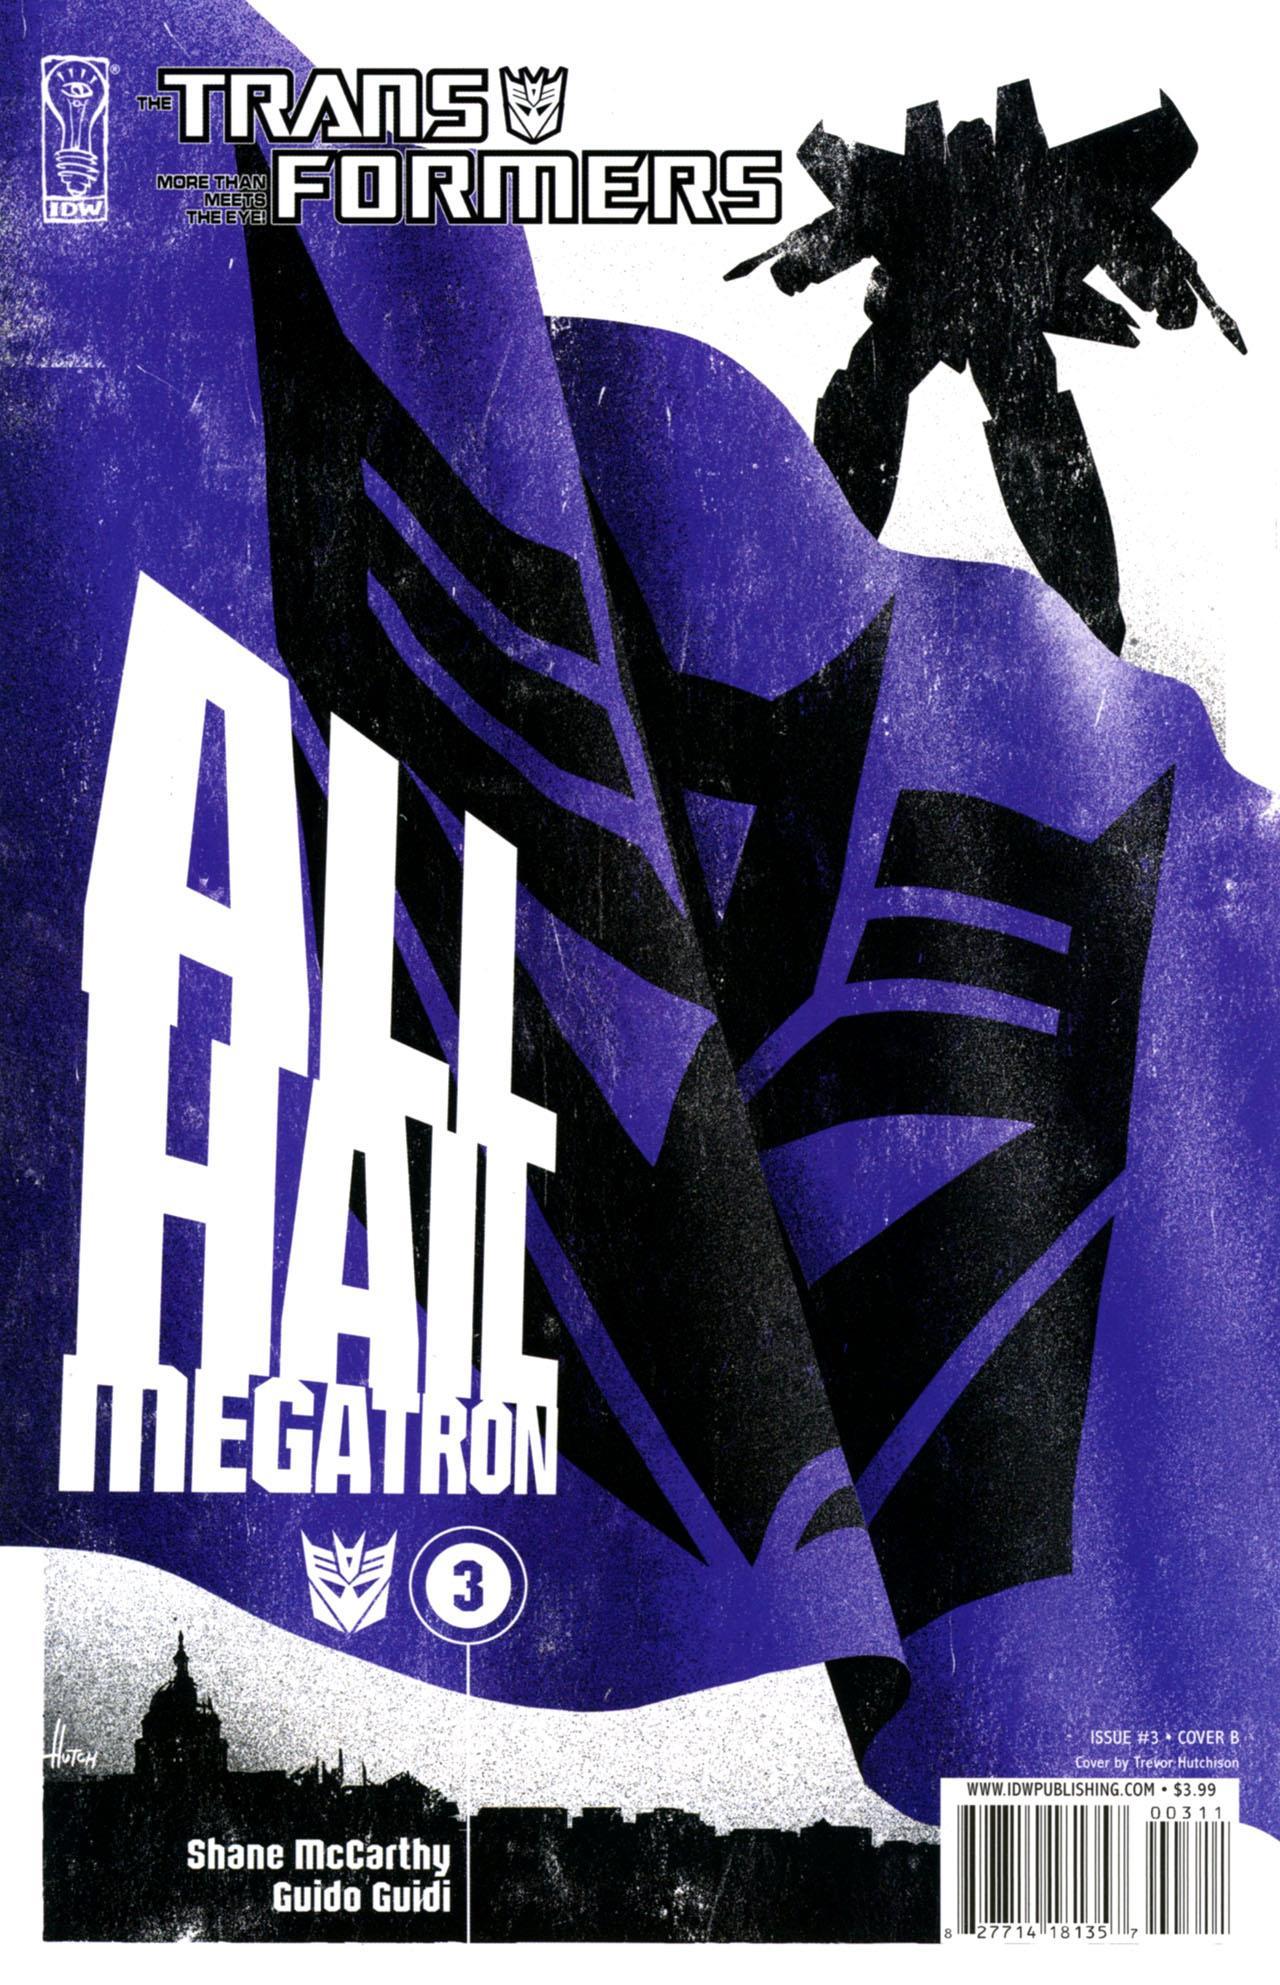 Cover B: Trevor Hutchison